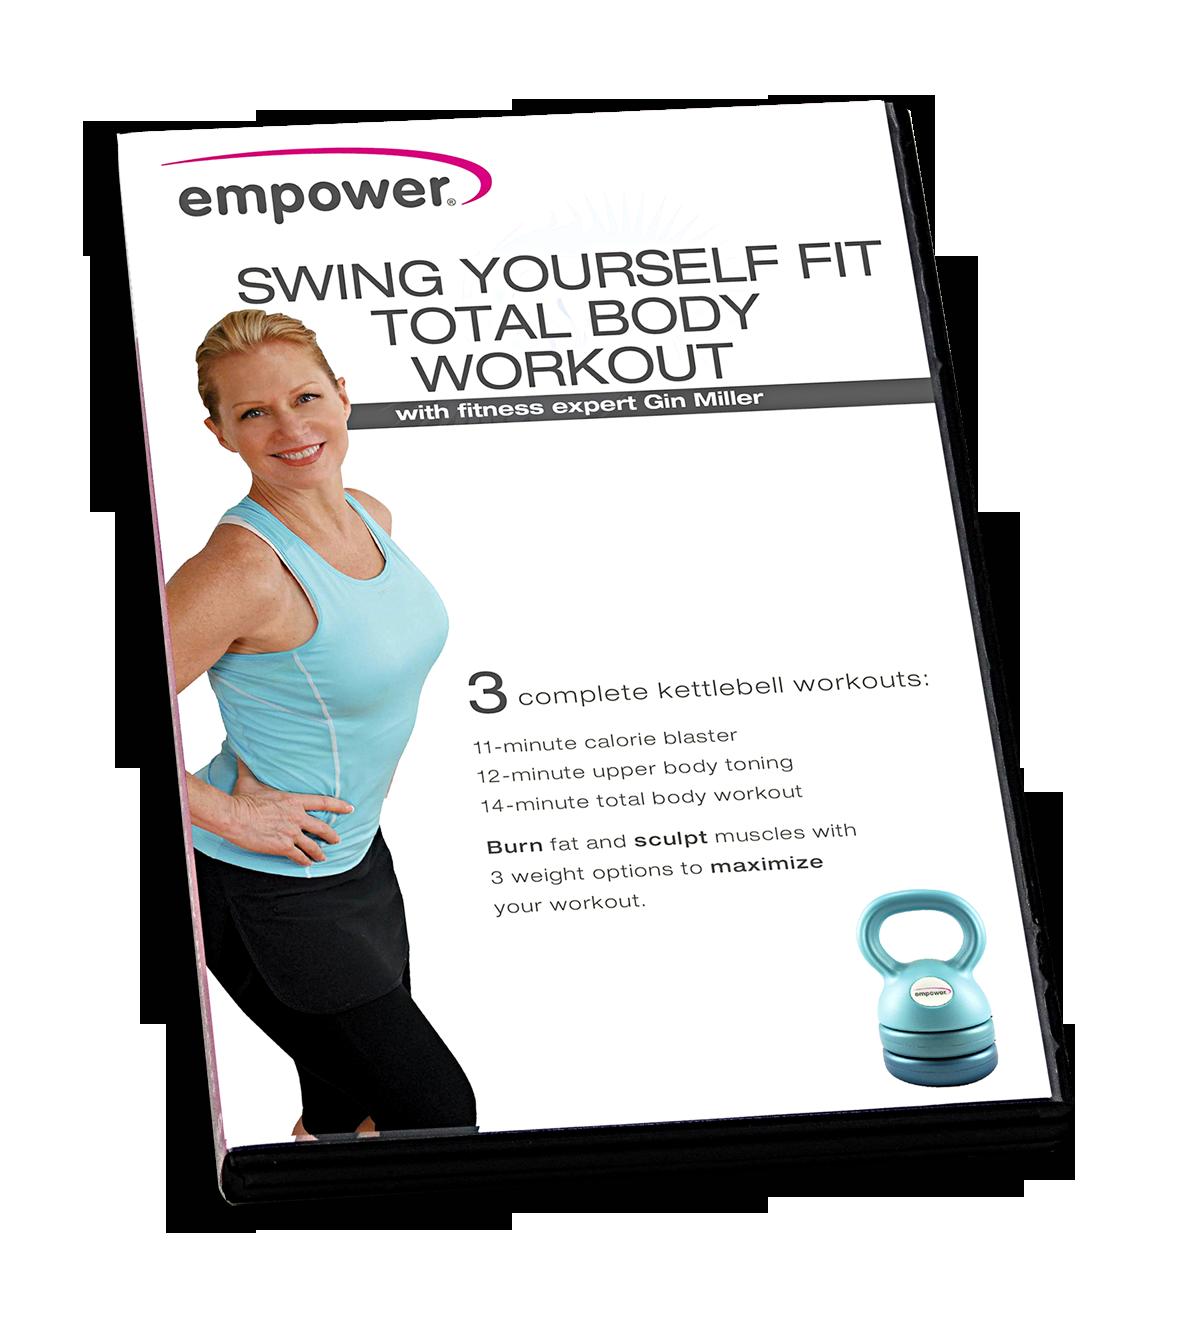 Kettlebell Workout Dvds Kettlebell Fitness Training Dvd: Empower 3-in-1 Adjustable